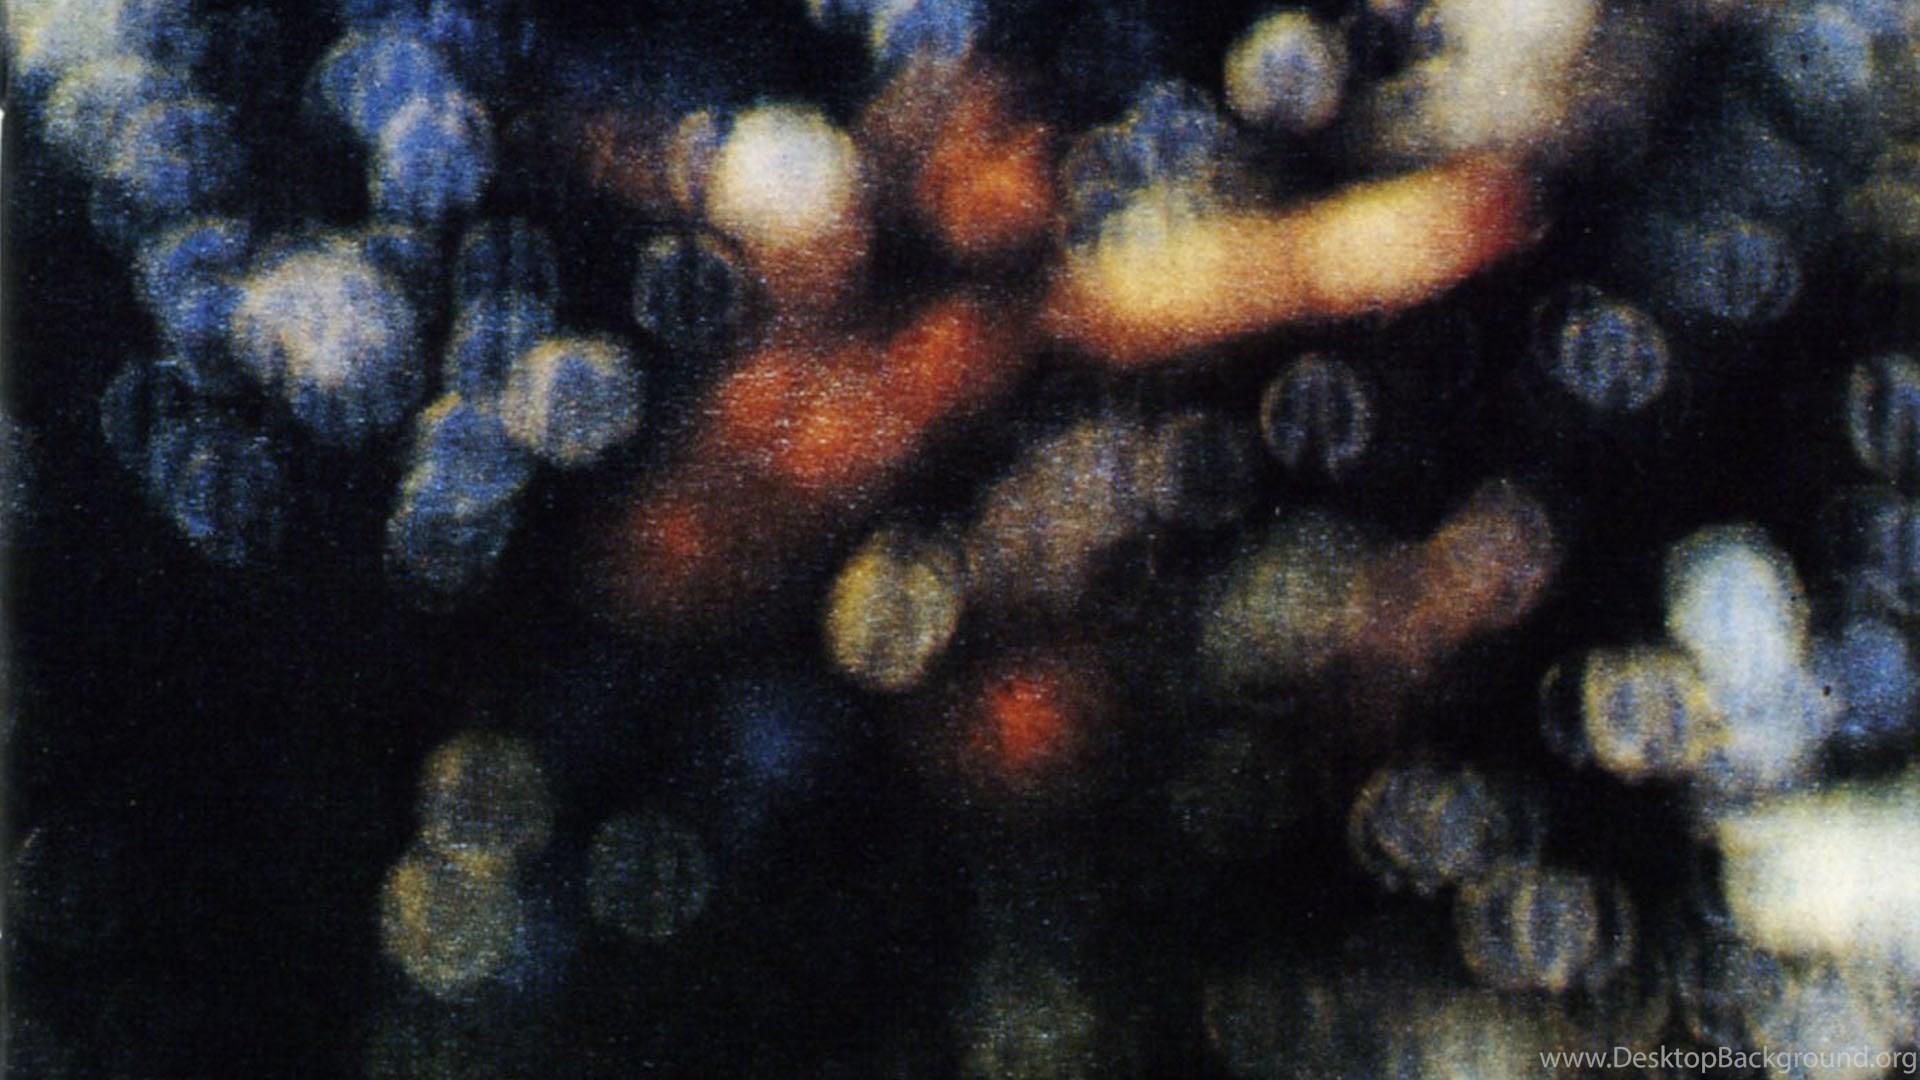 Wallpapers High Hopes Pink Floyd 1920x1080 Desktop Background